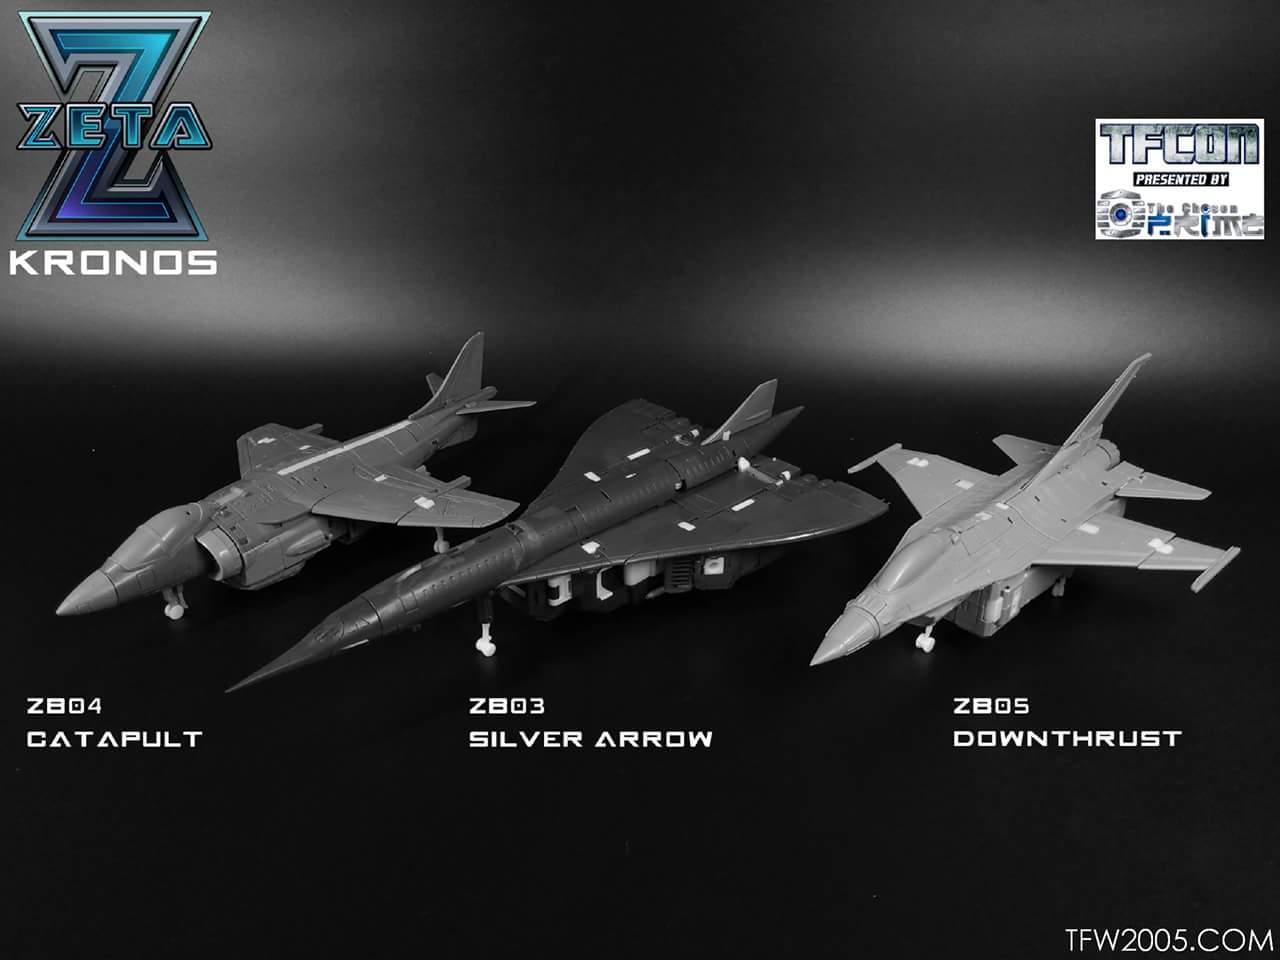 [Zeta Toys] Produit Tiers ― Kronos (ZB-01 à ZB-05) ― ZB-06|ZB-07 Superitron ― aka Superion - Page 2 92DX8pae_o